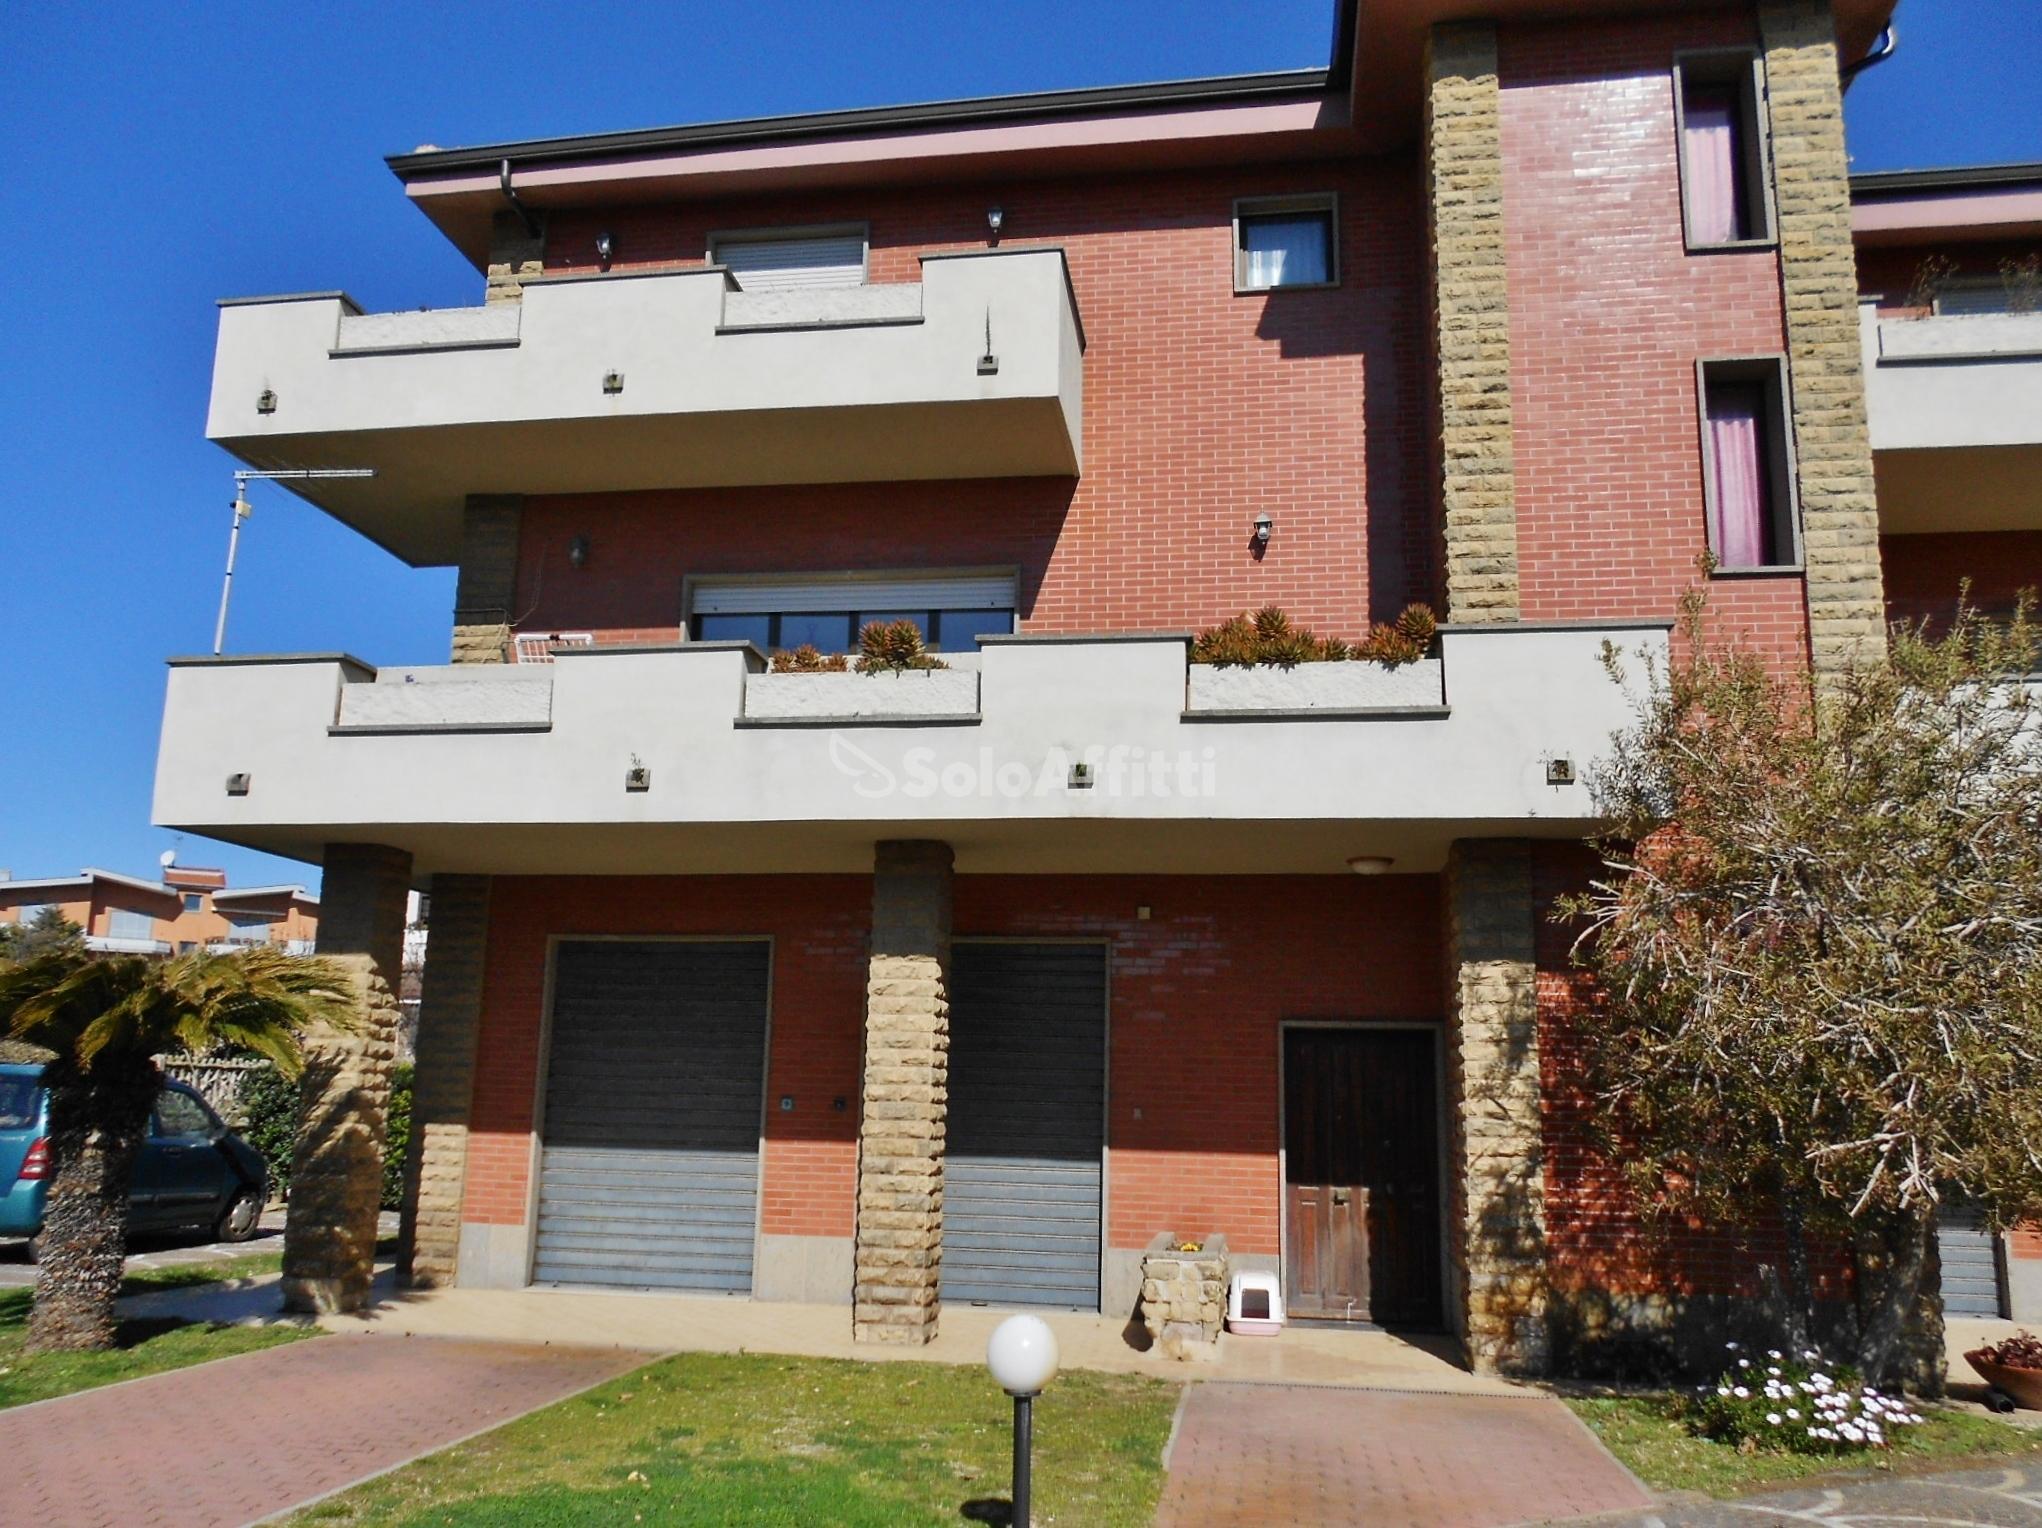 Fiumicino, centro - ampio quadrilocale arredato